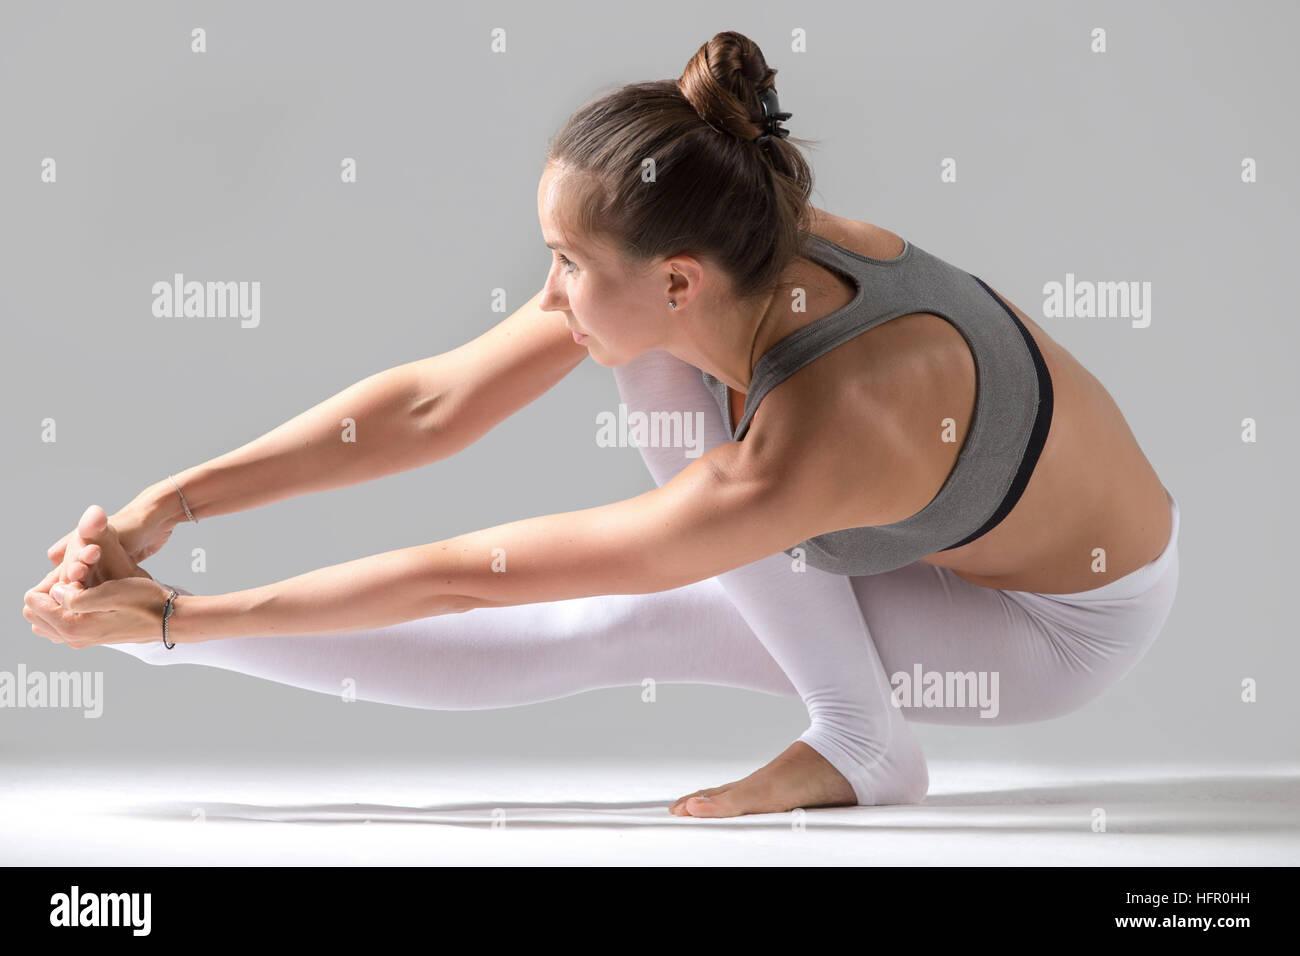 Woman doing Eka Pada Padangusthasana pose with squat - Stock Image